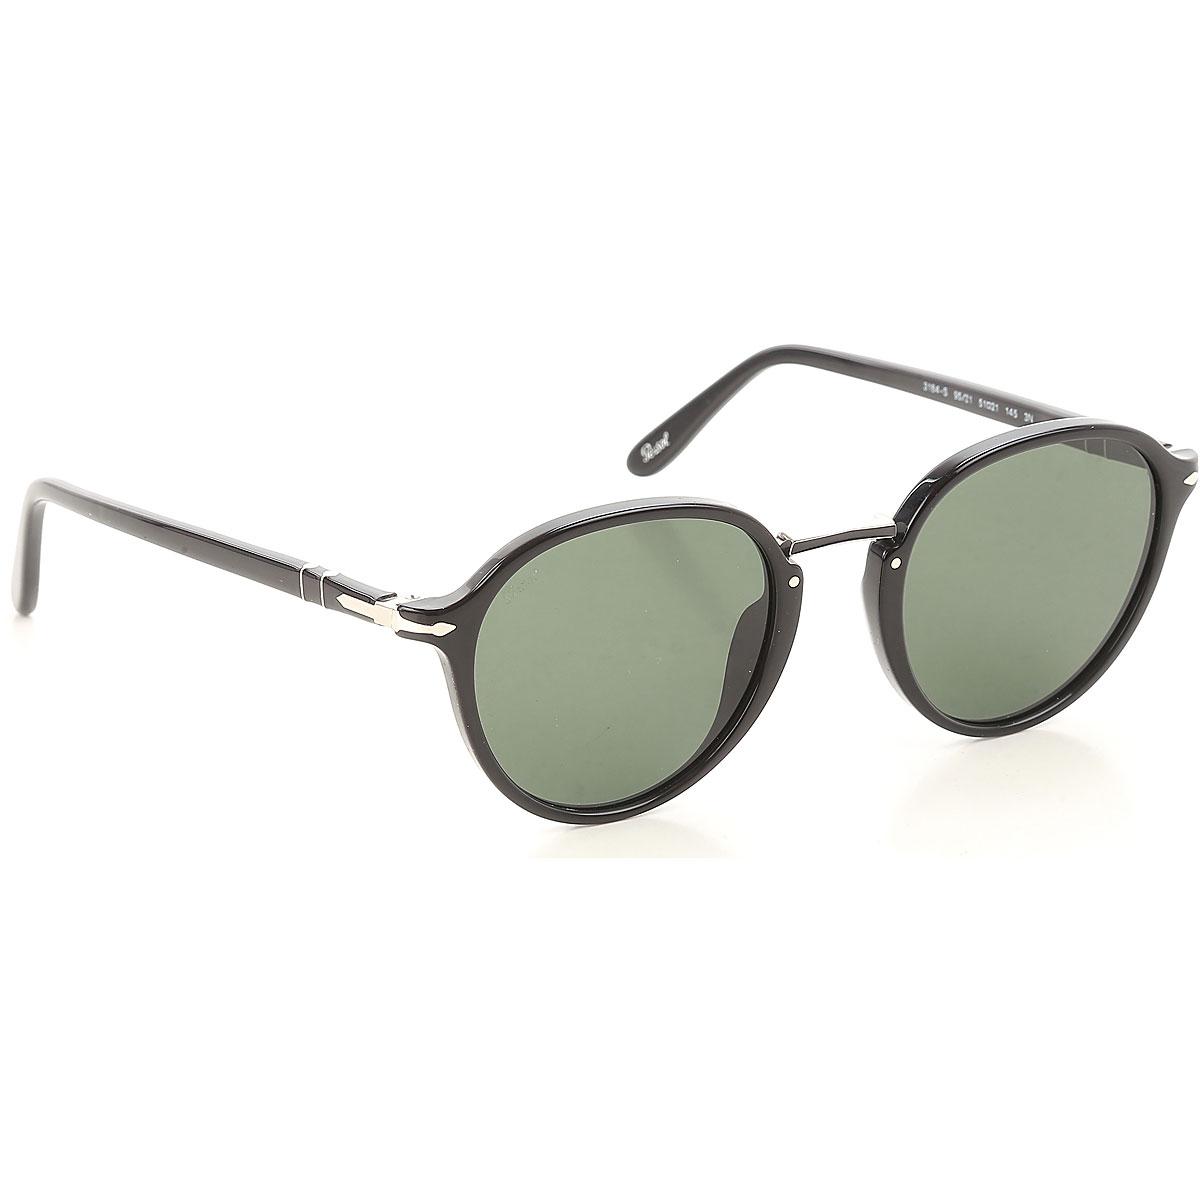 Persol Sunglasses On Sale, Black, 2019